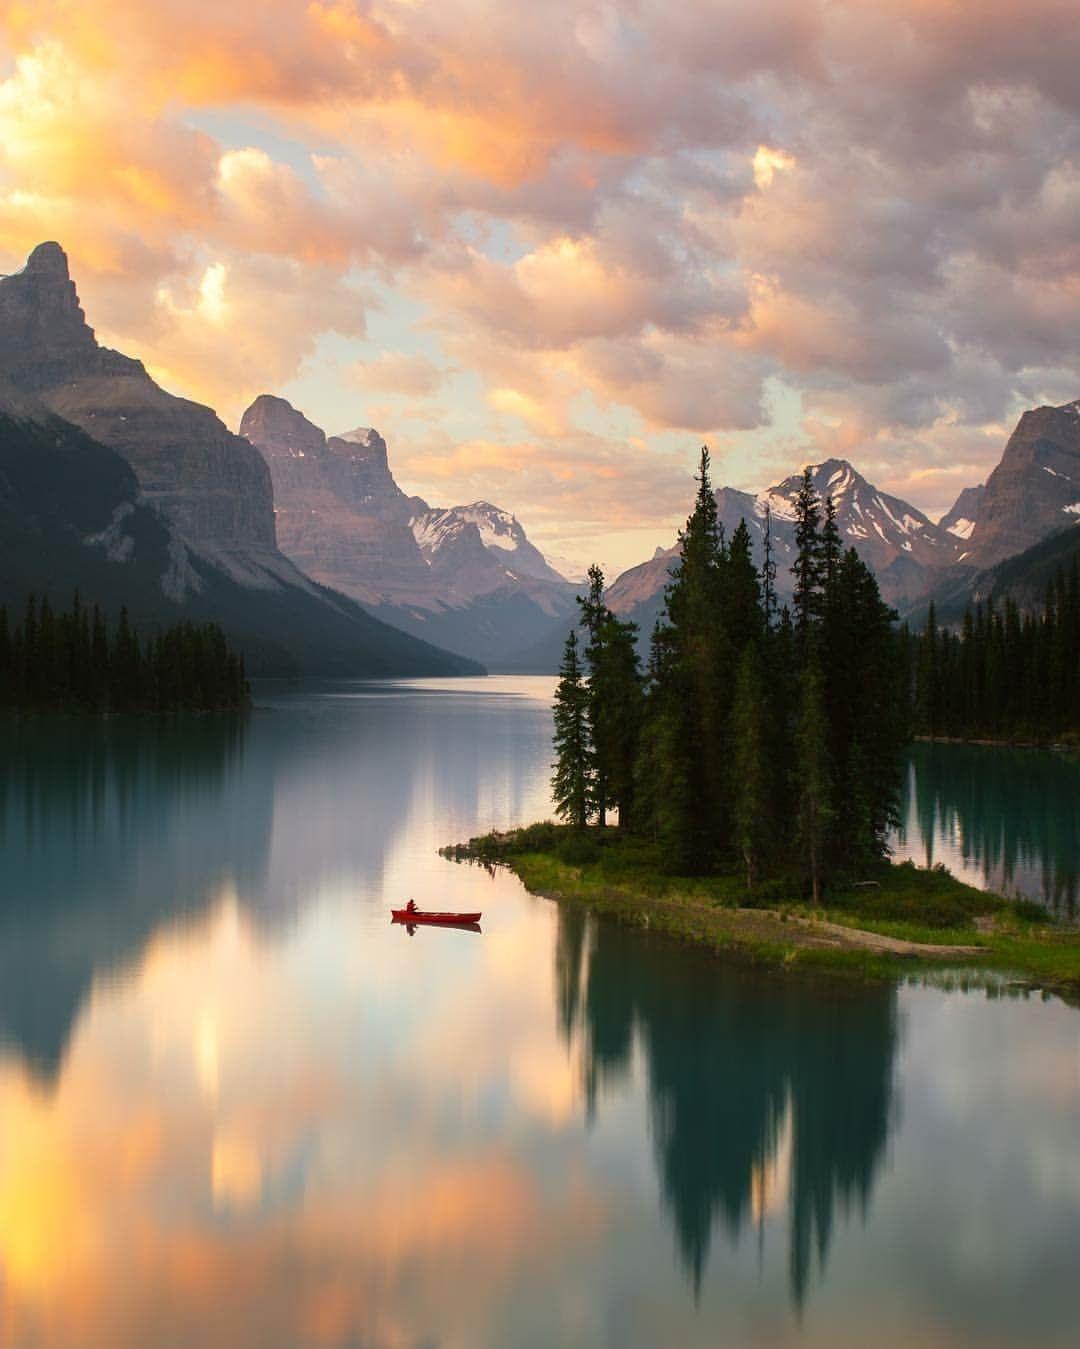 Spirit Island Maligne Lake In Jasper National Park From Karl Shakur Beautiful Nature Nature Nature Photography